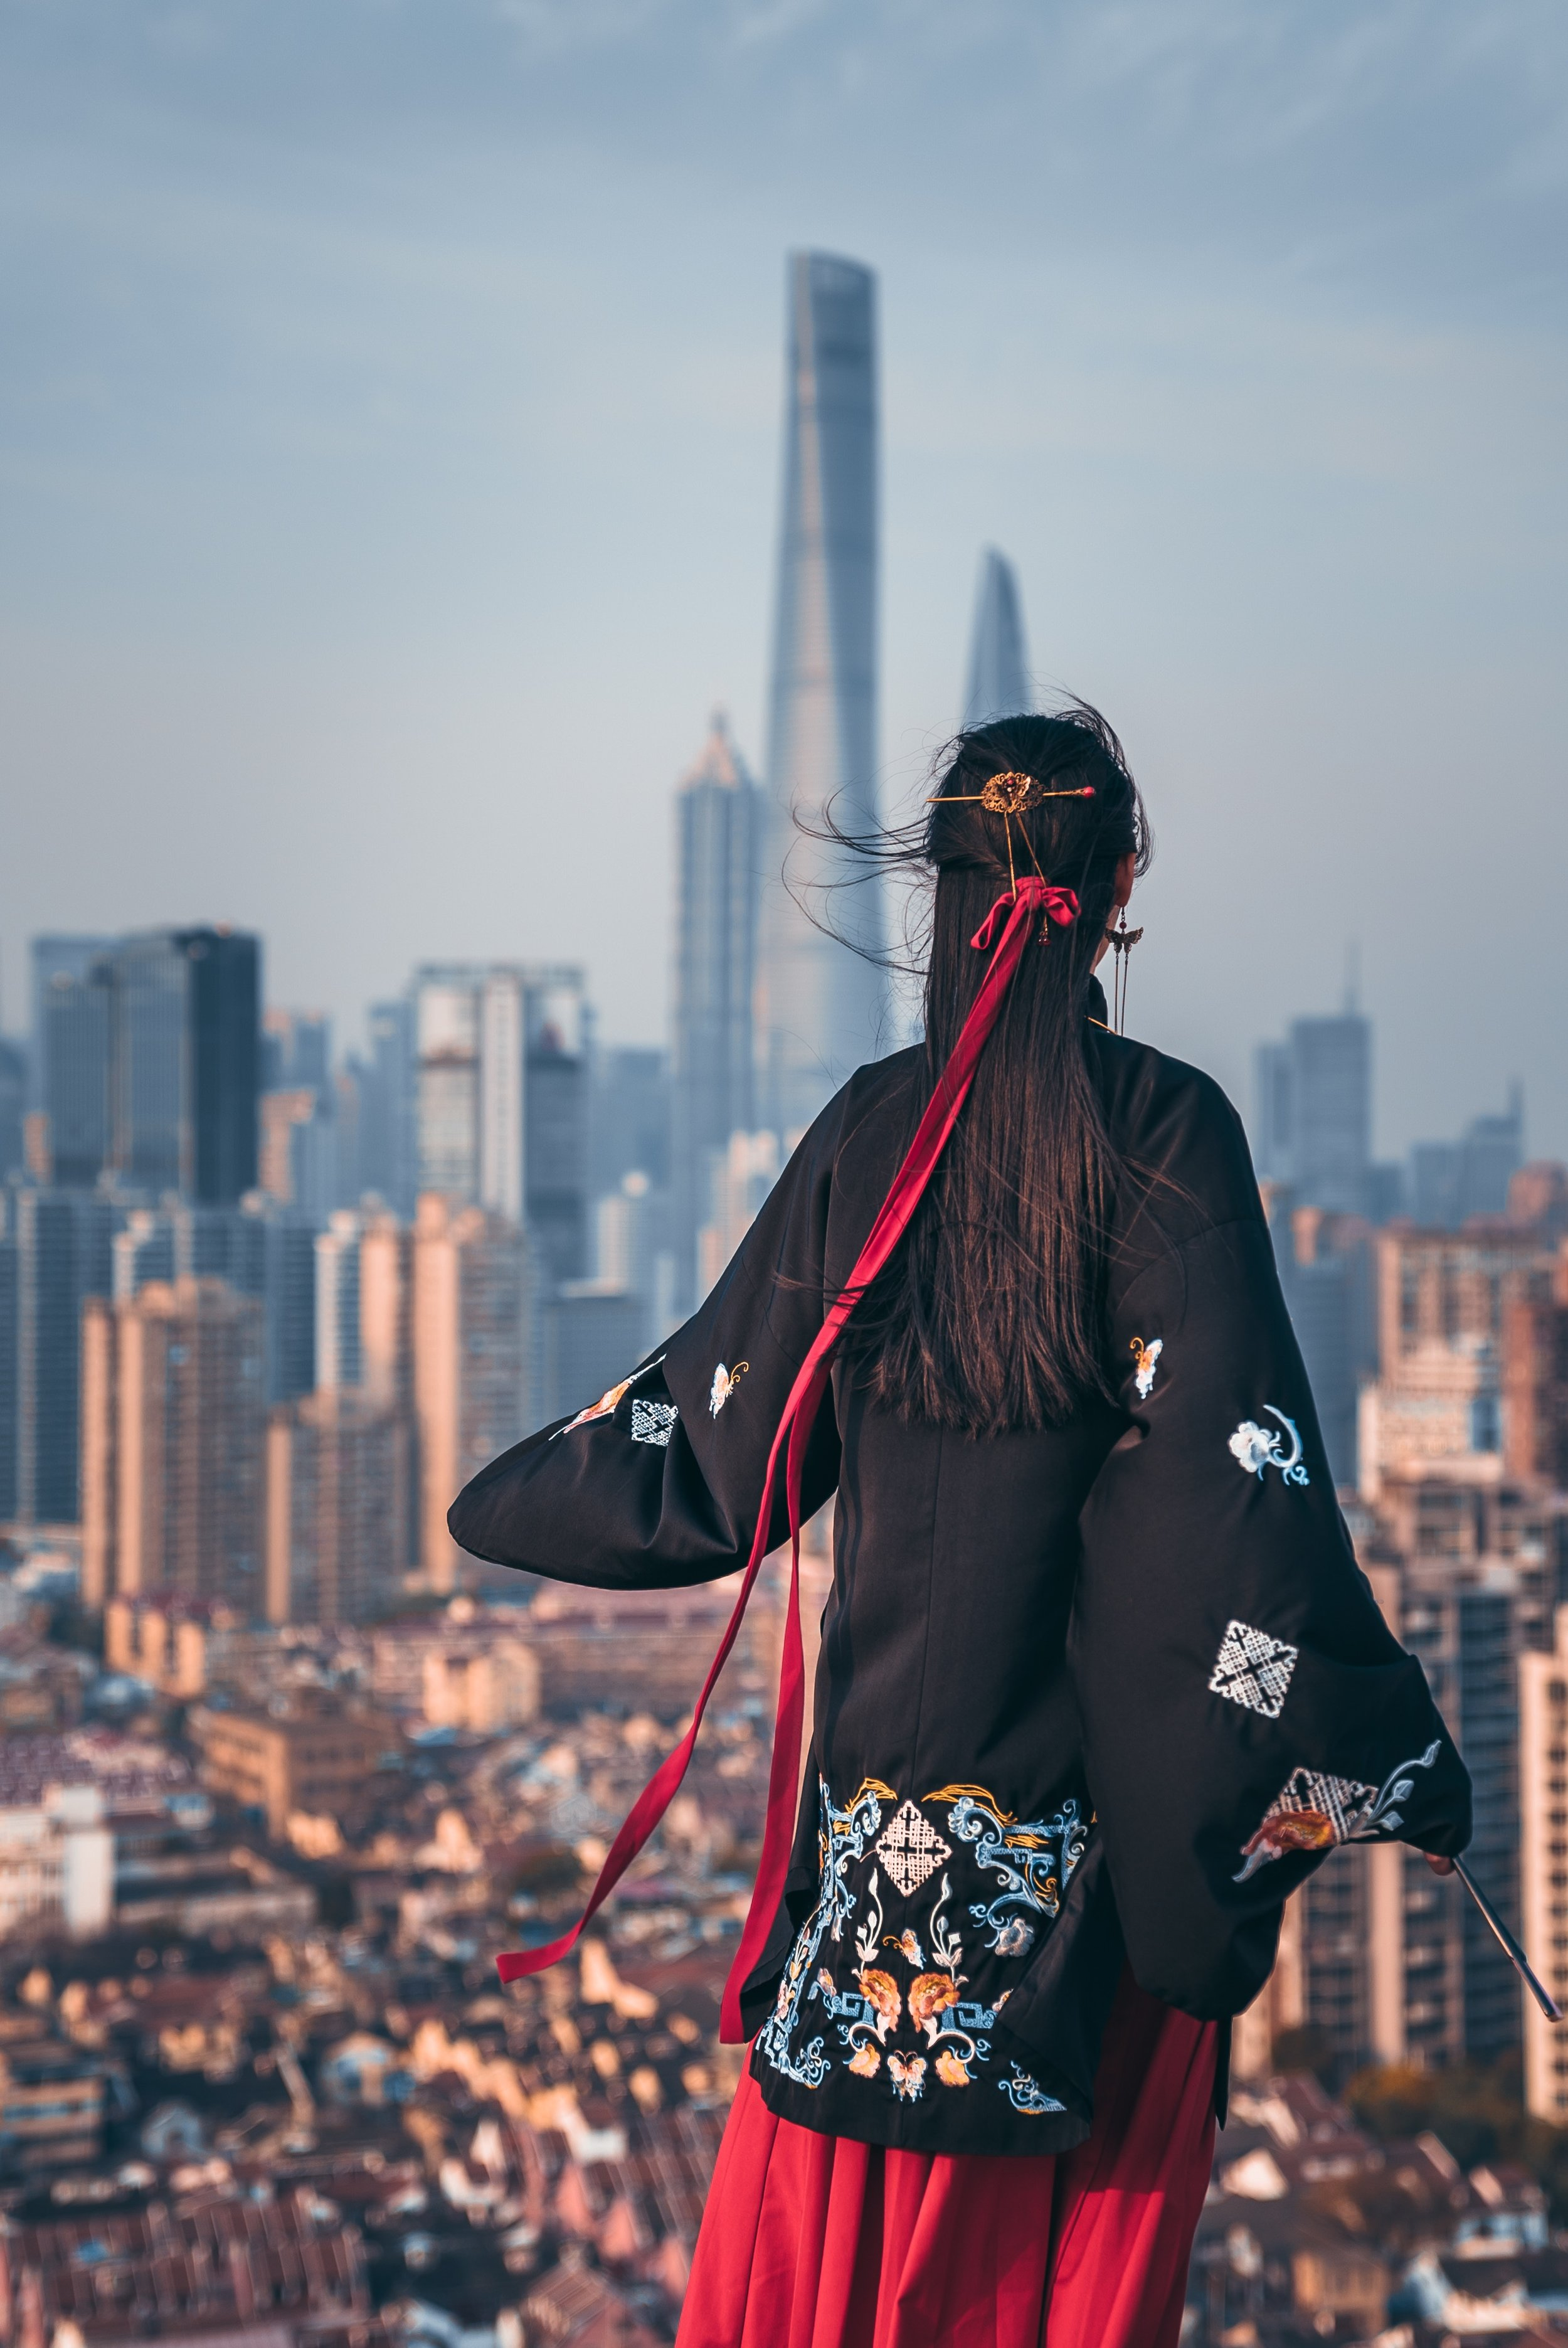 Girl overlooks the Bund, Shanghai. Photo Credit: Yiran Ding